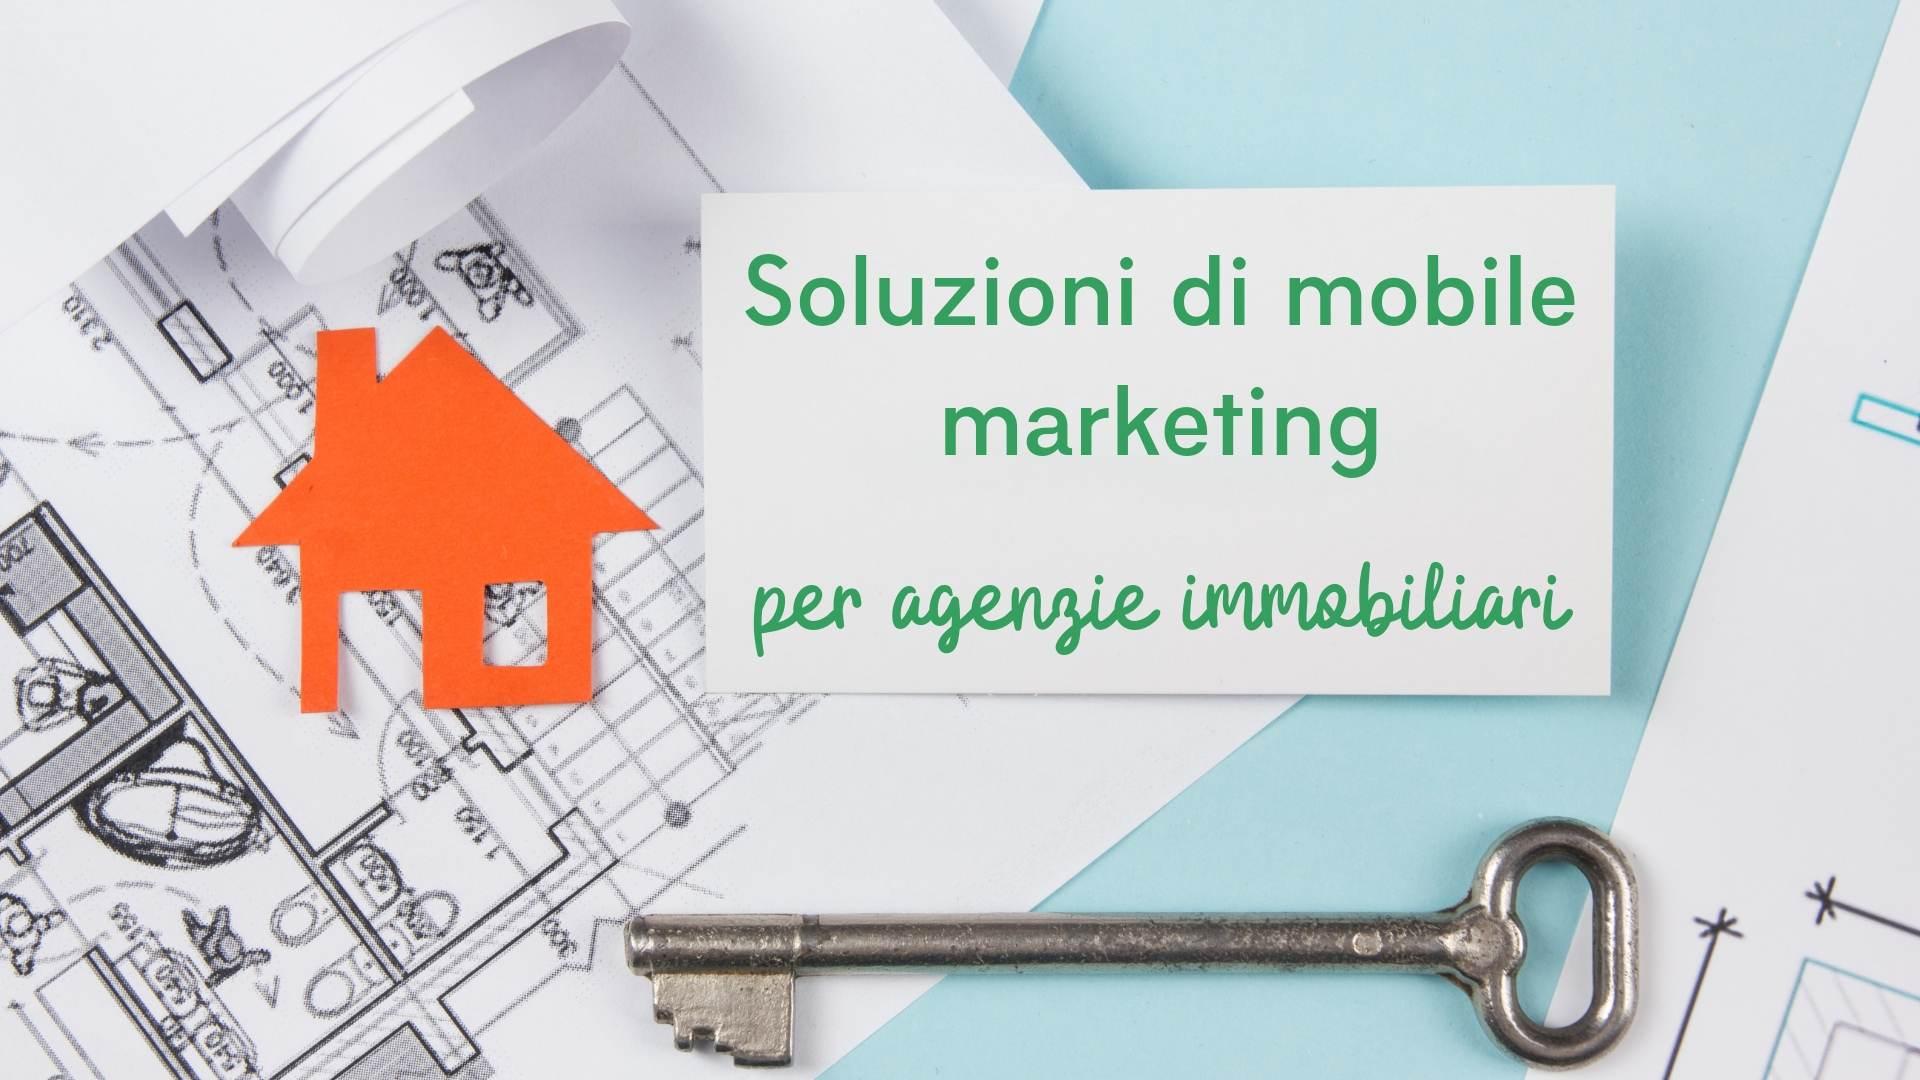 Soluzione di mobile marketing per agenzie immobiliari